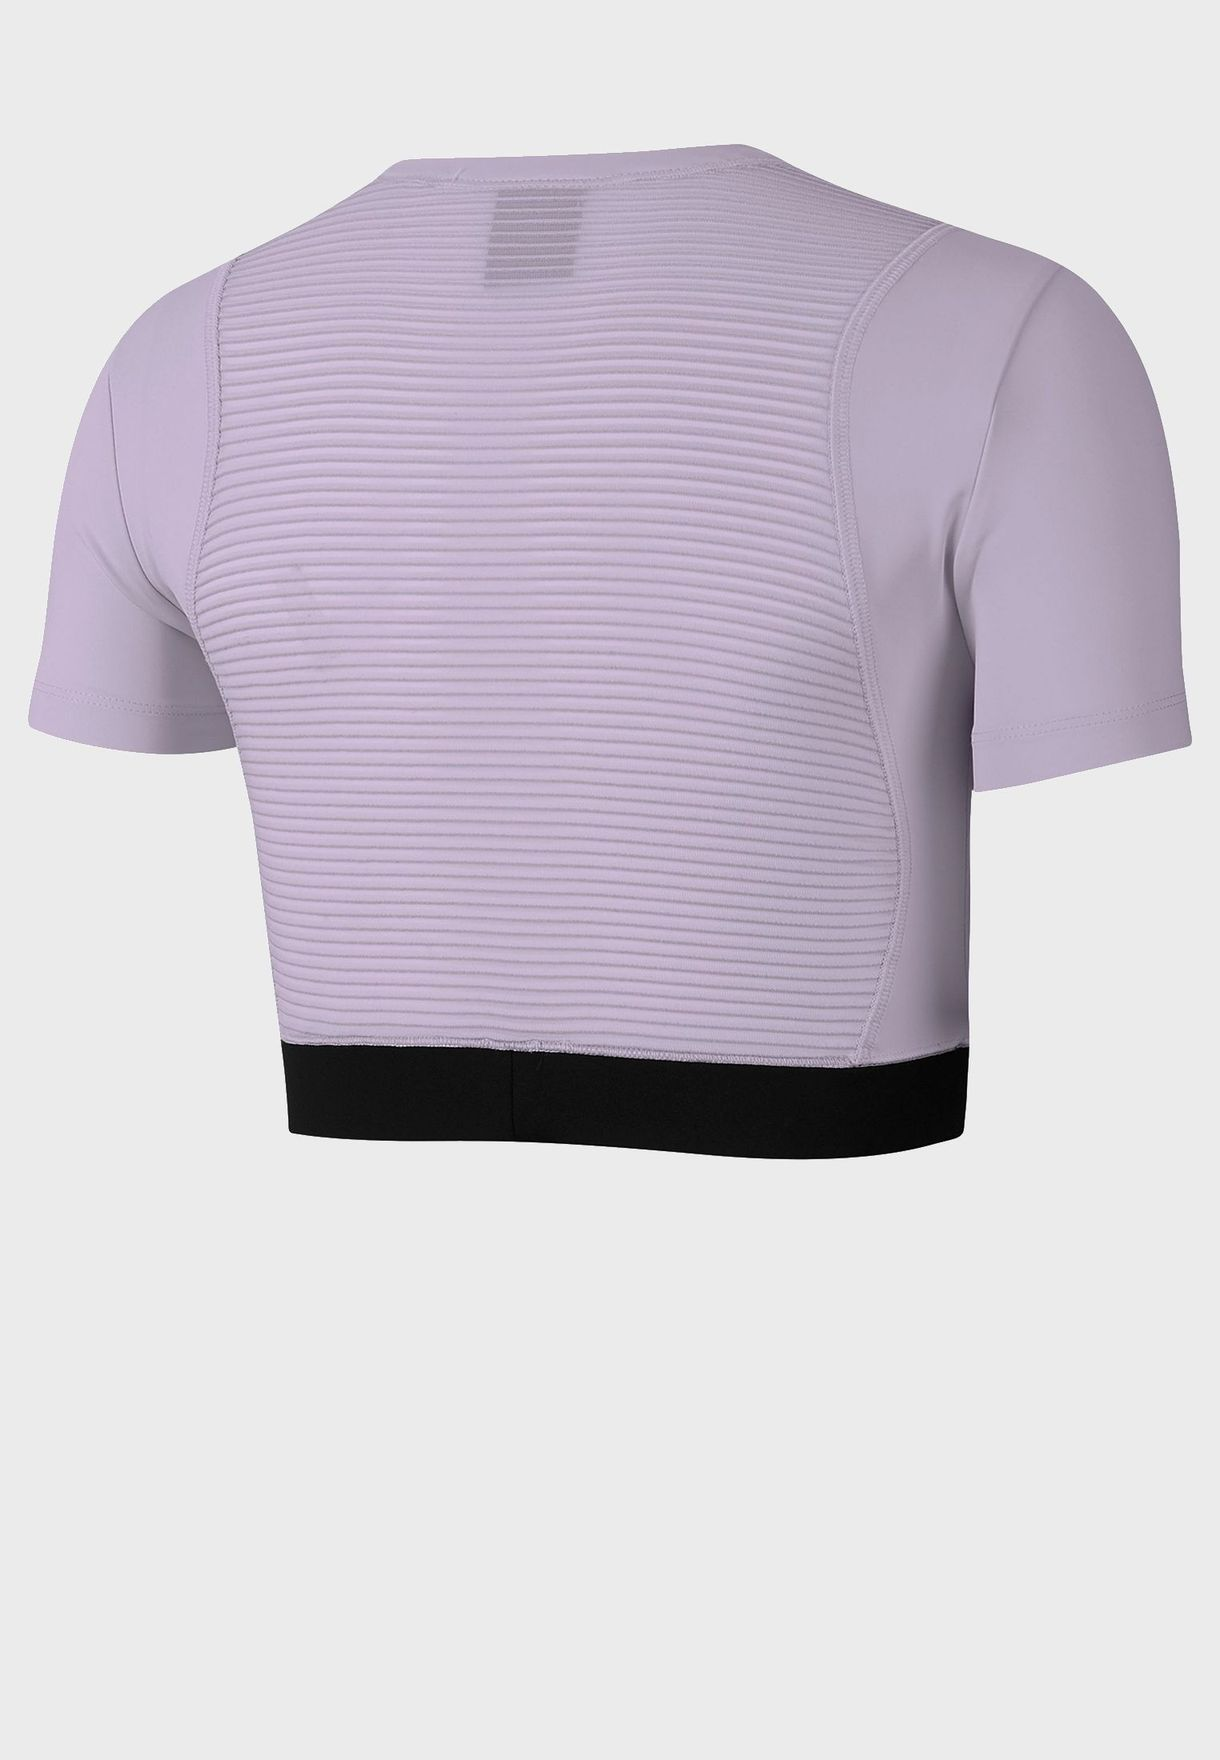 Buy Nike Purple Aero Adapt Cropped Top For Women, Uae 72704at76ycp